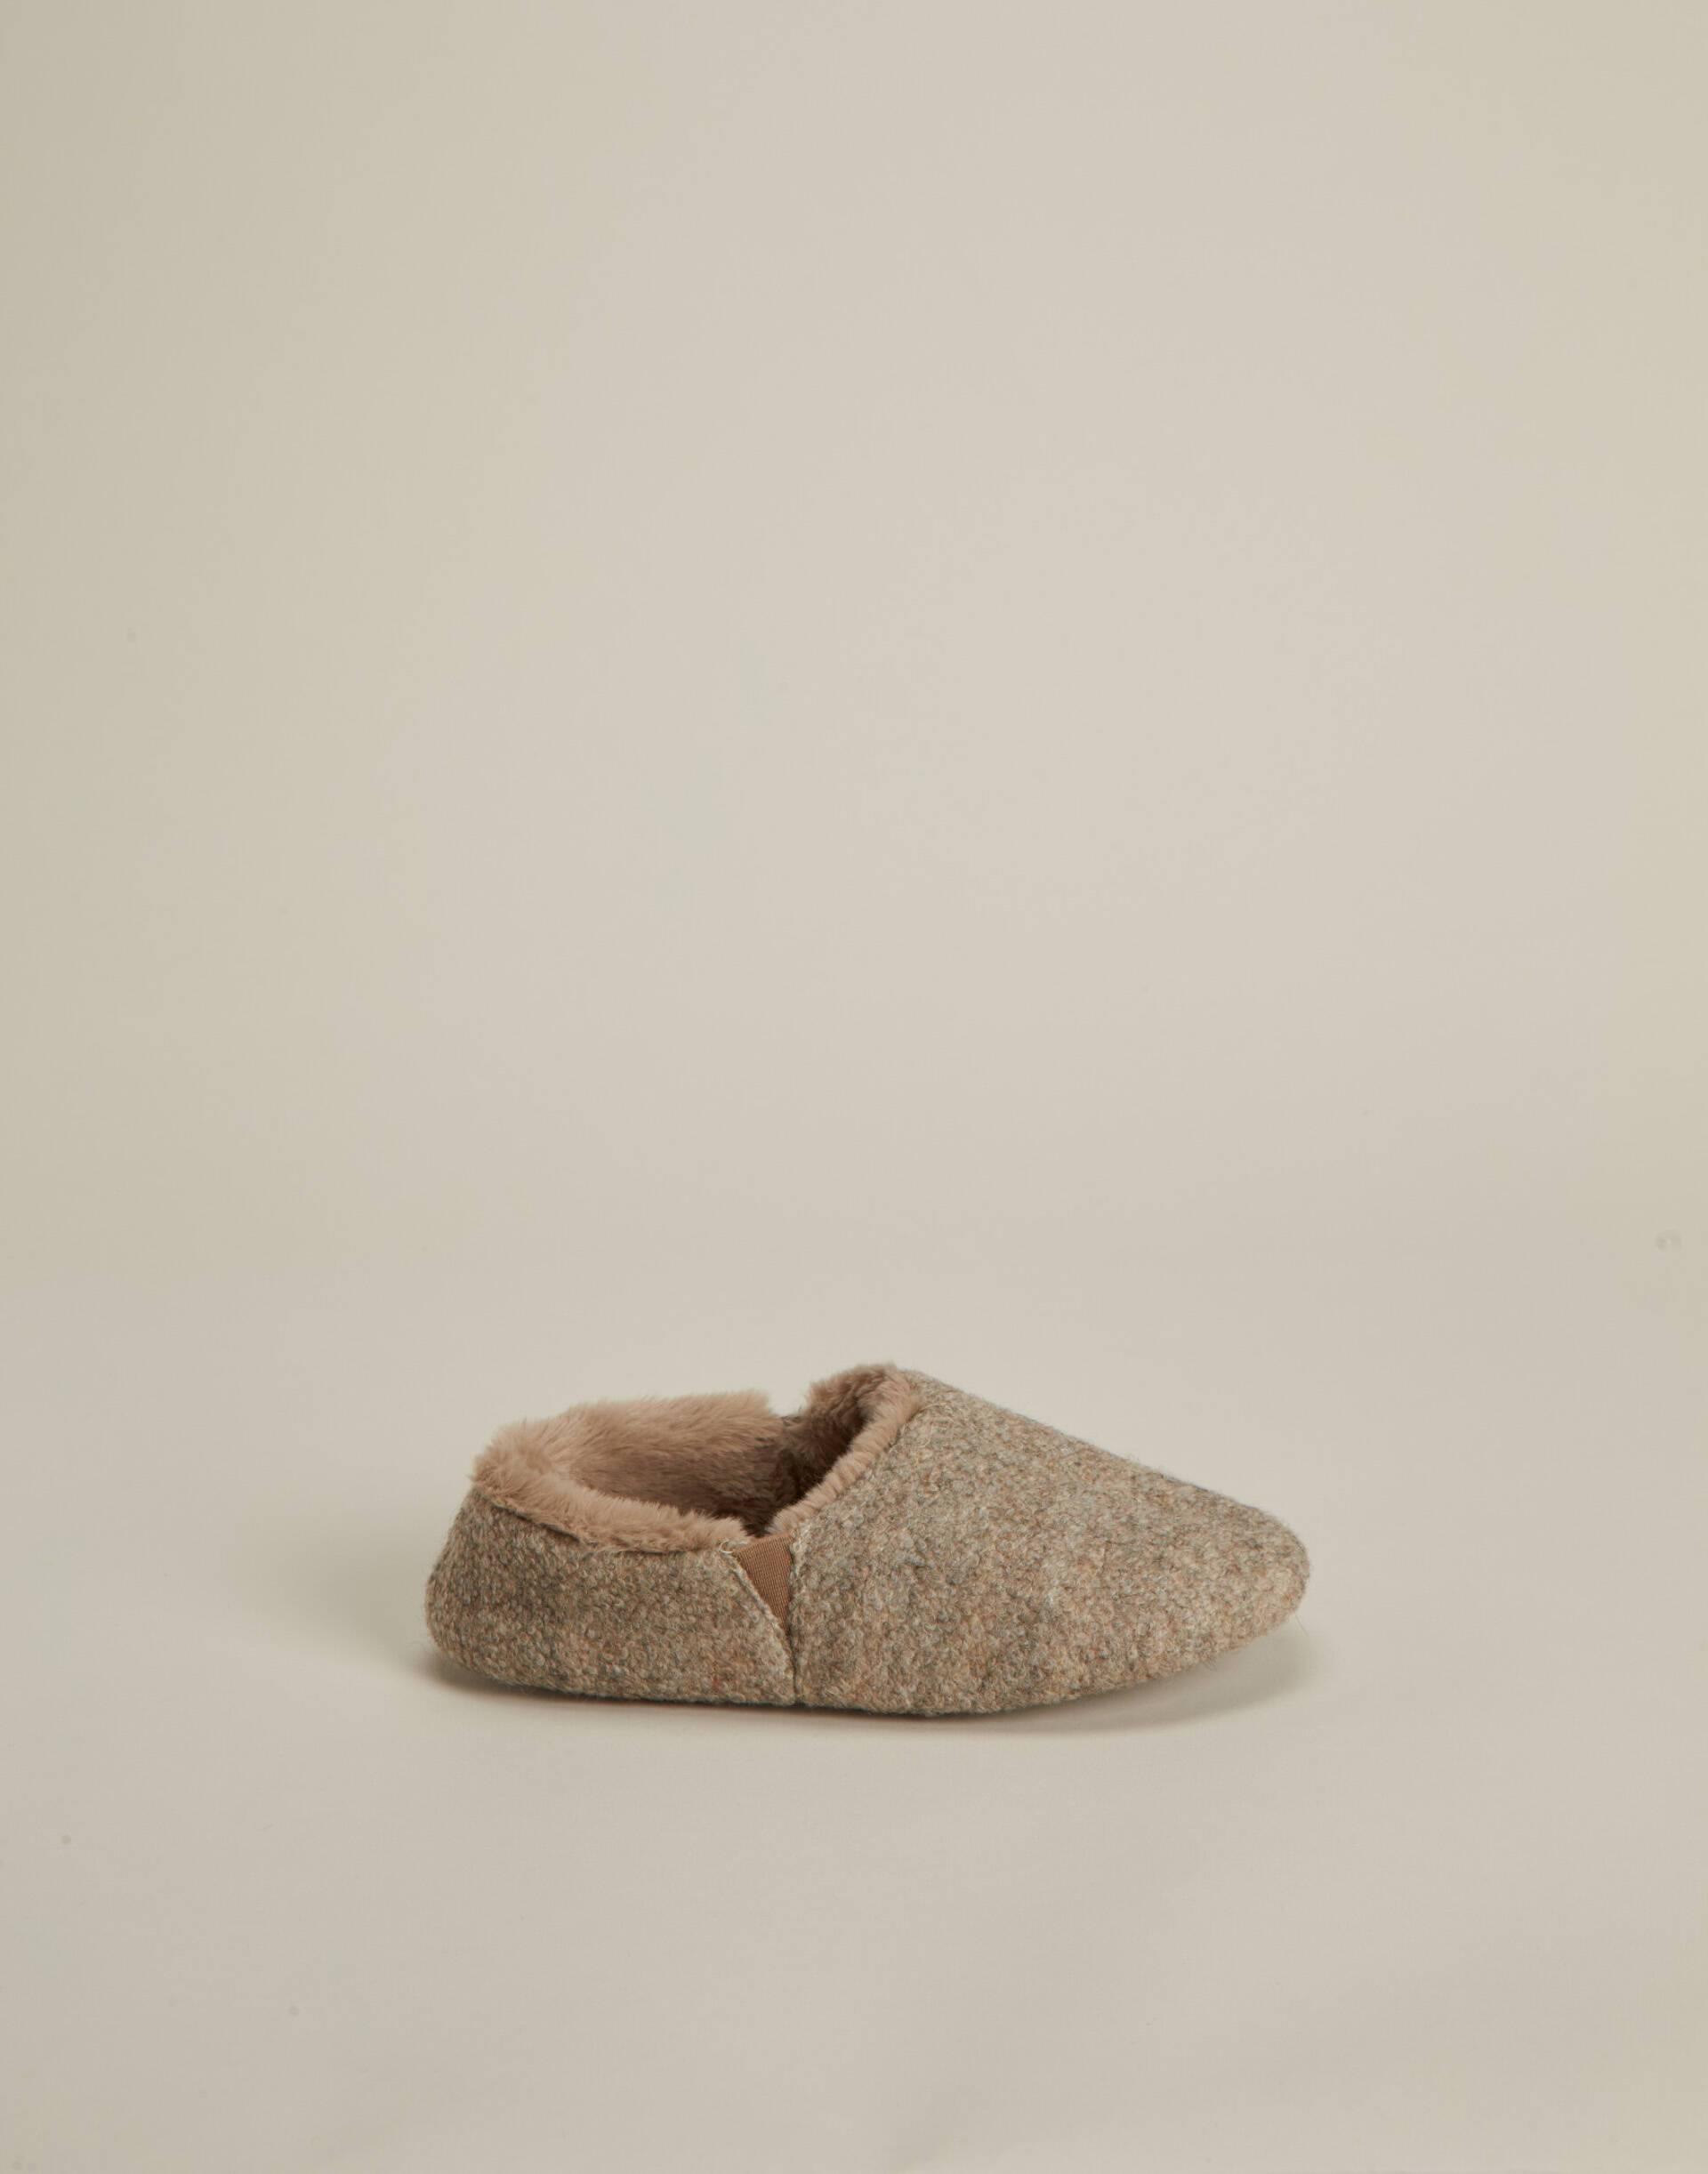 Zapatilla cerrada lana